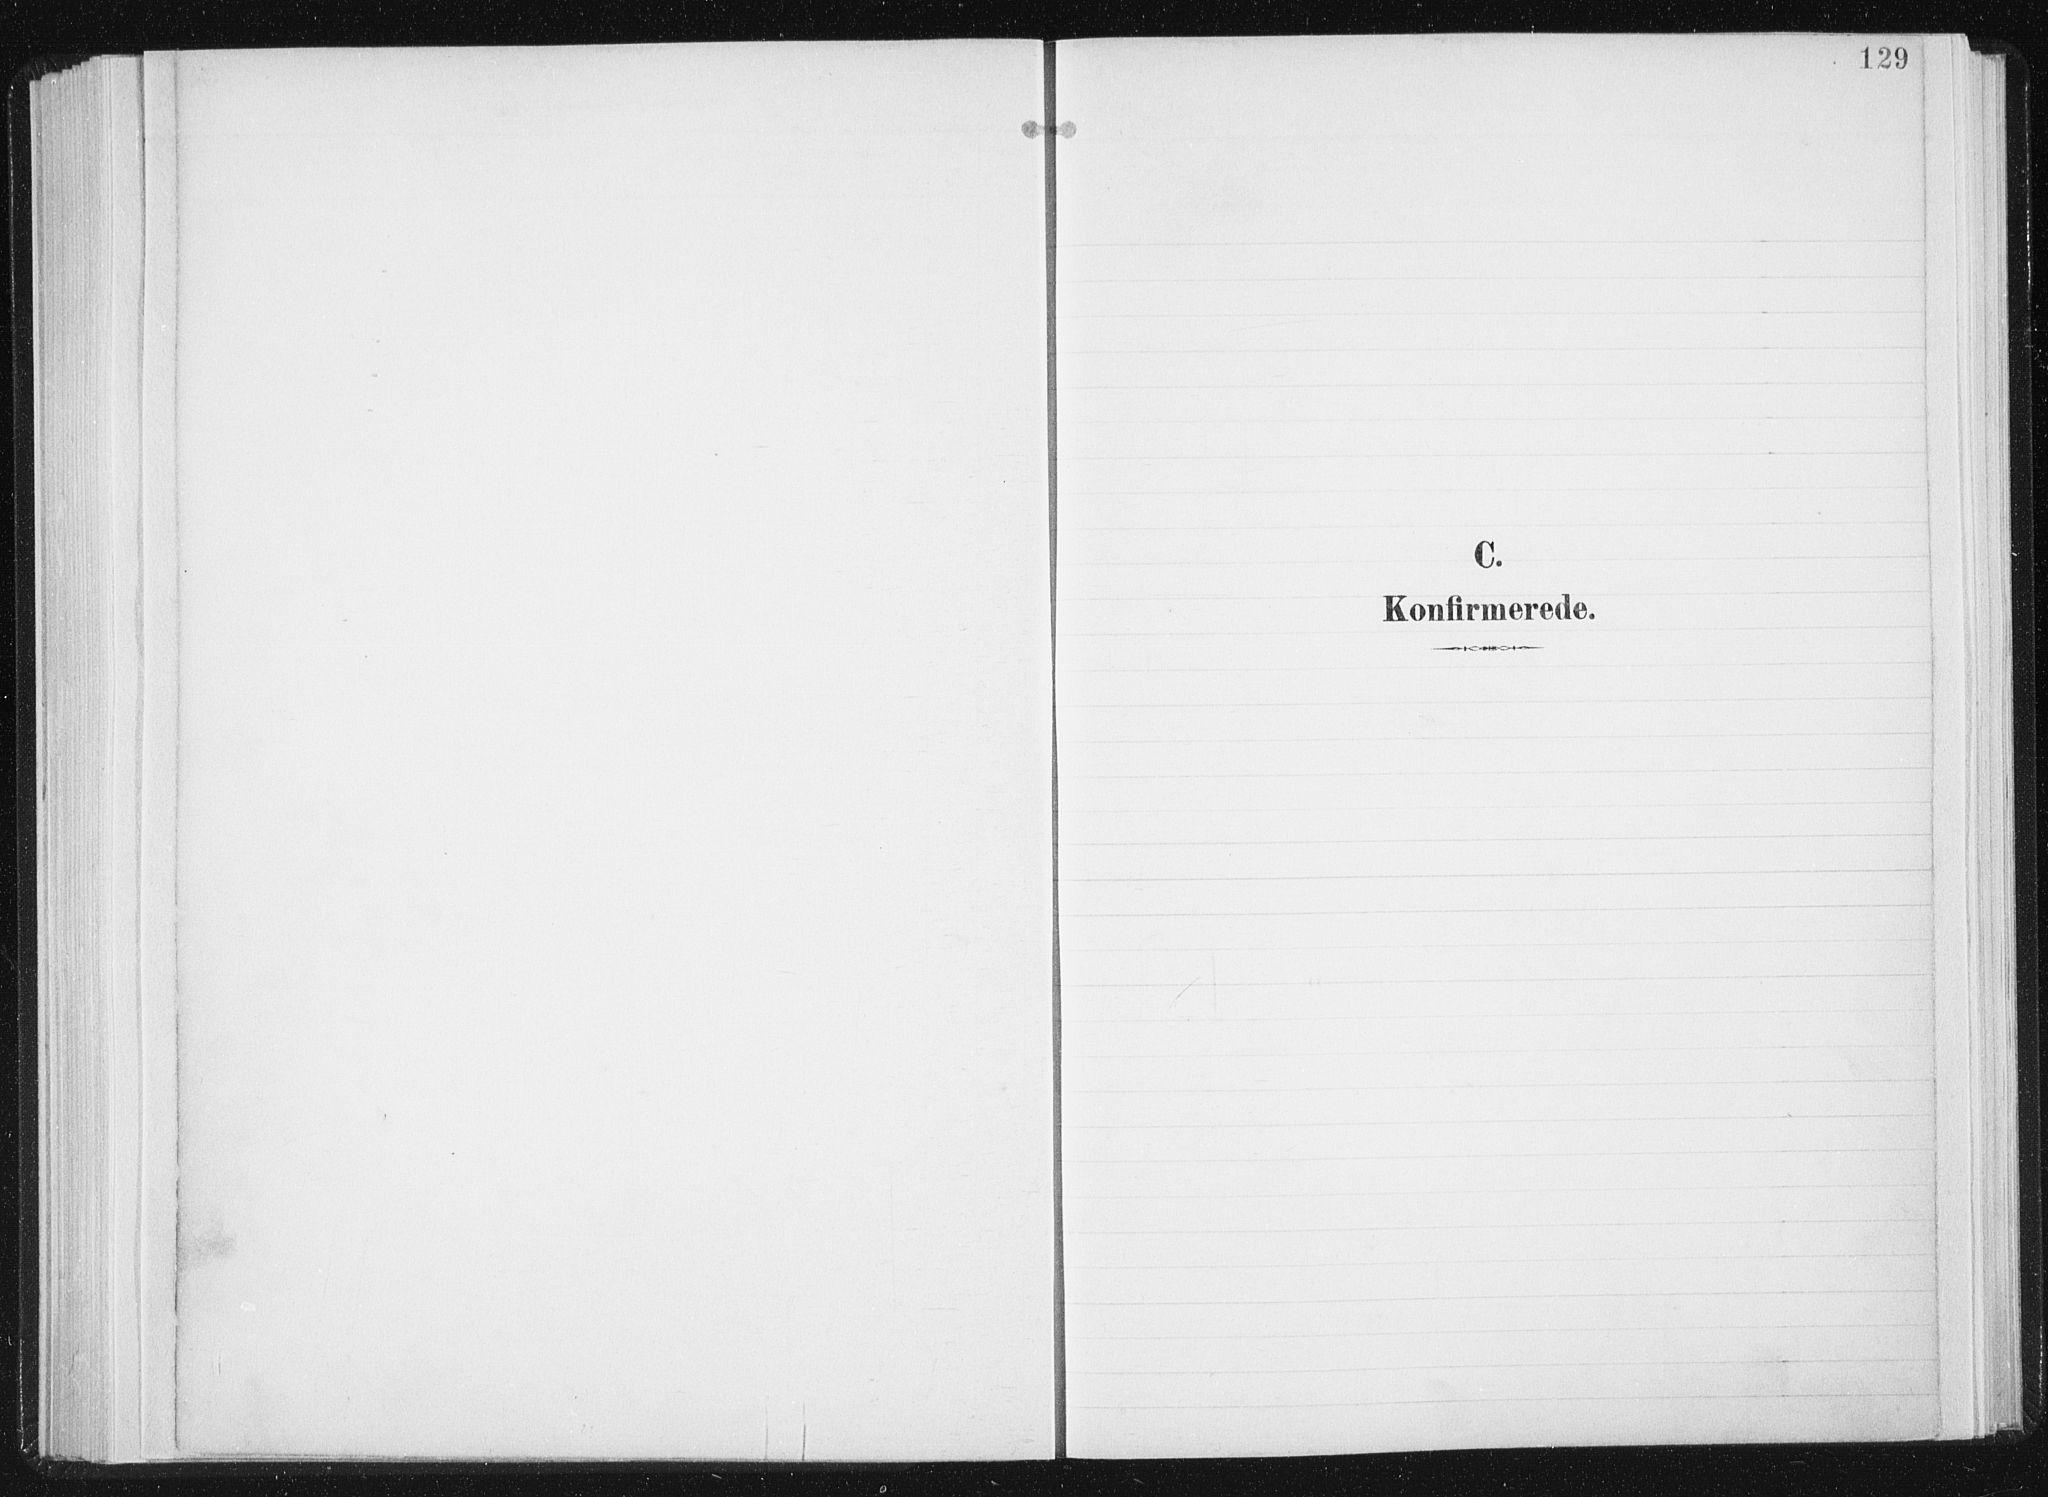 SAT, Ministerialprotokoller, klokkerbøker og fødselsregistre - Sør-Trøndelag, 647/L0635: Parish register (official) no. 647A02, 1896-1911, p. 129